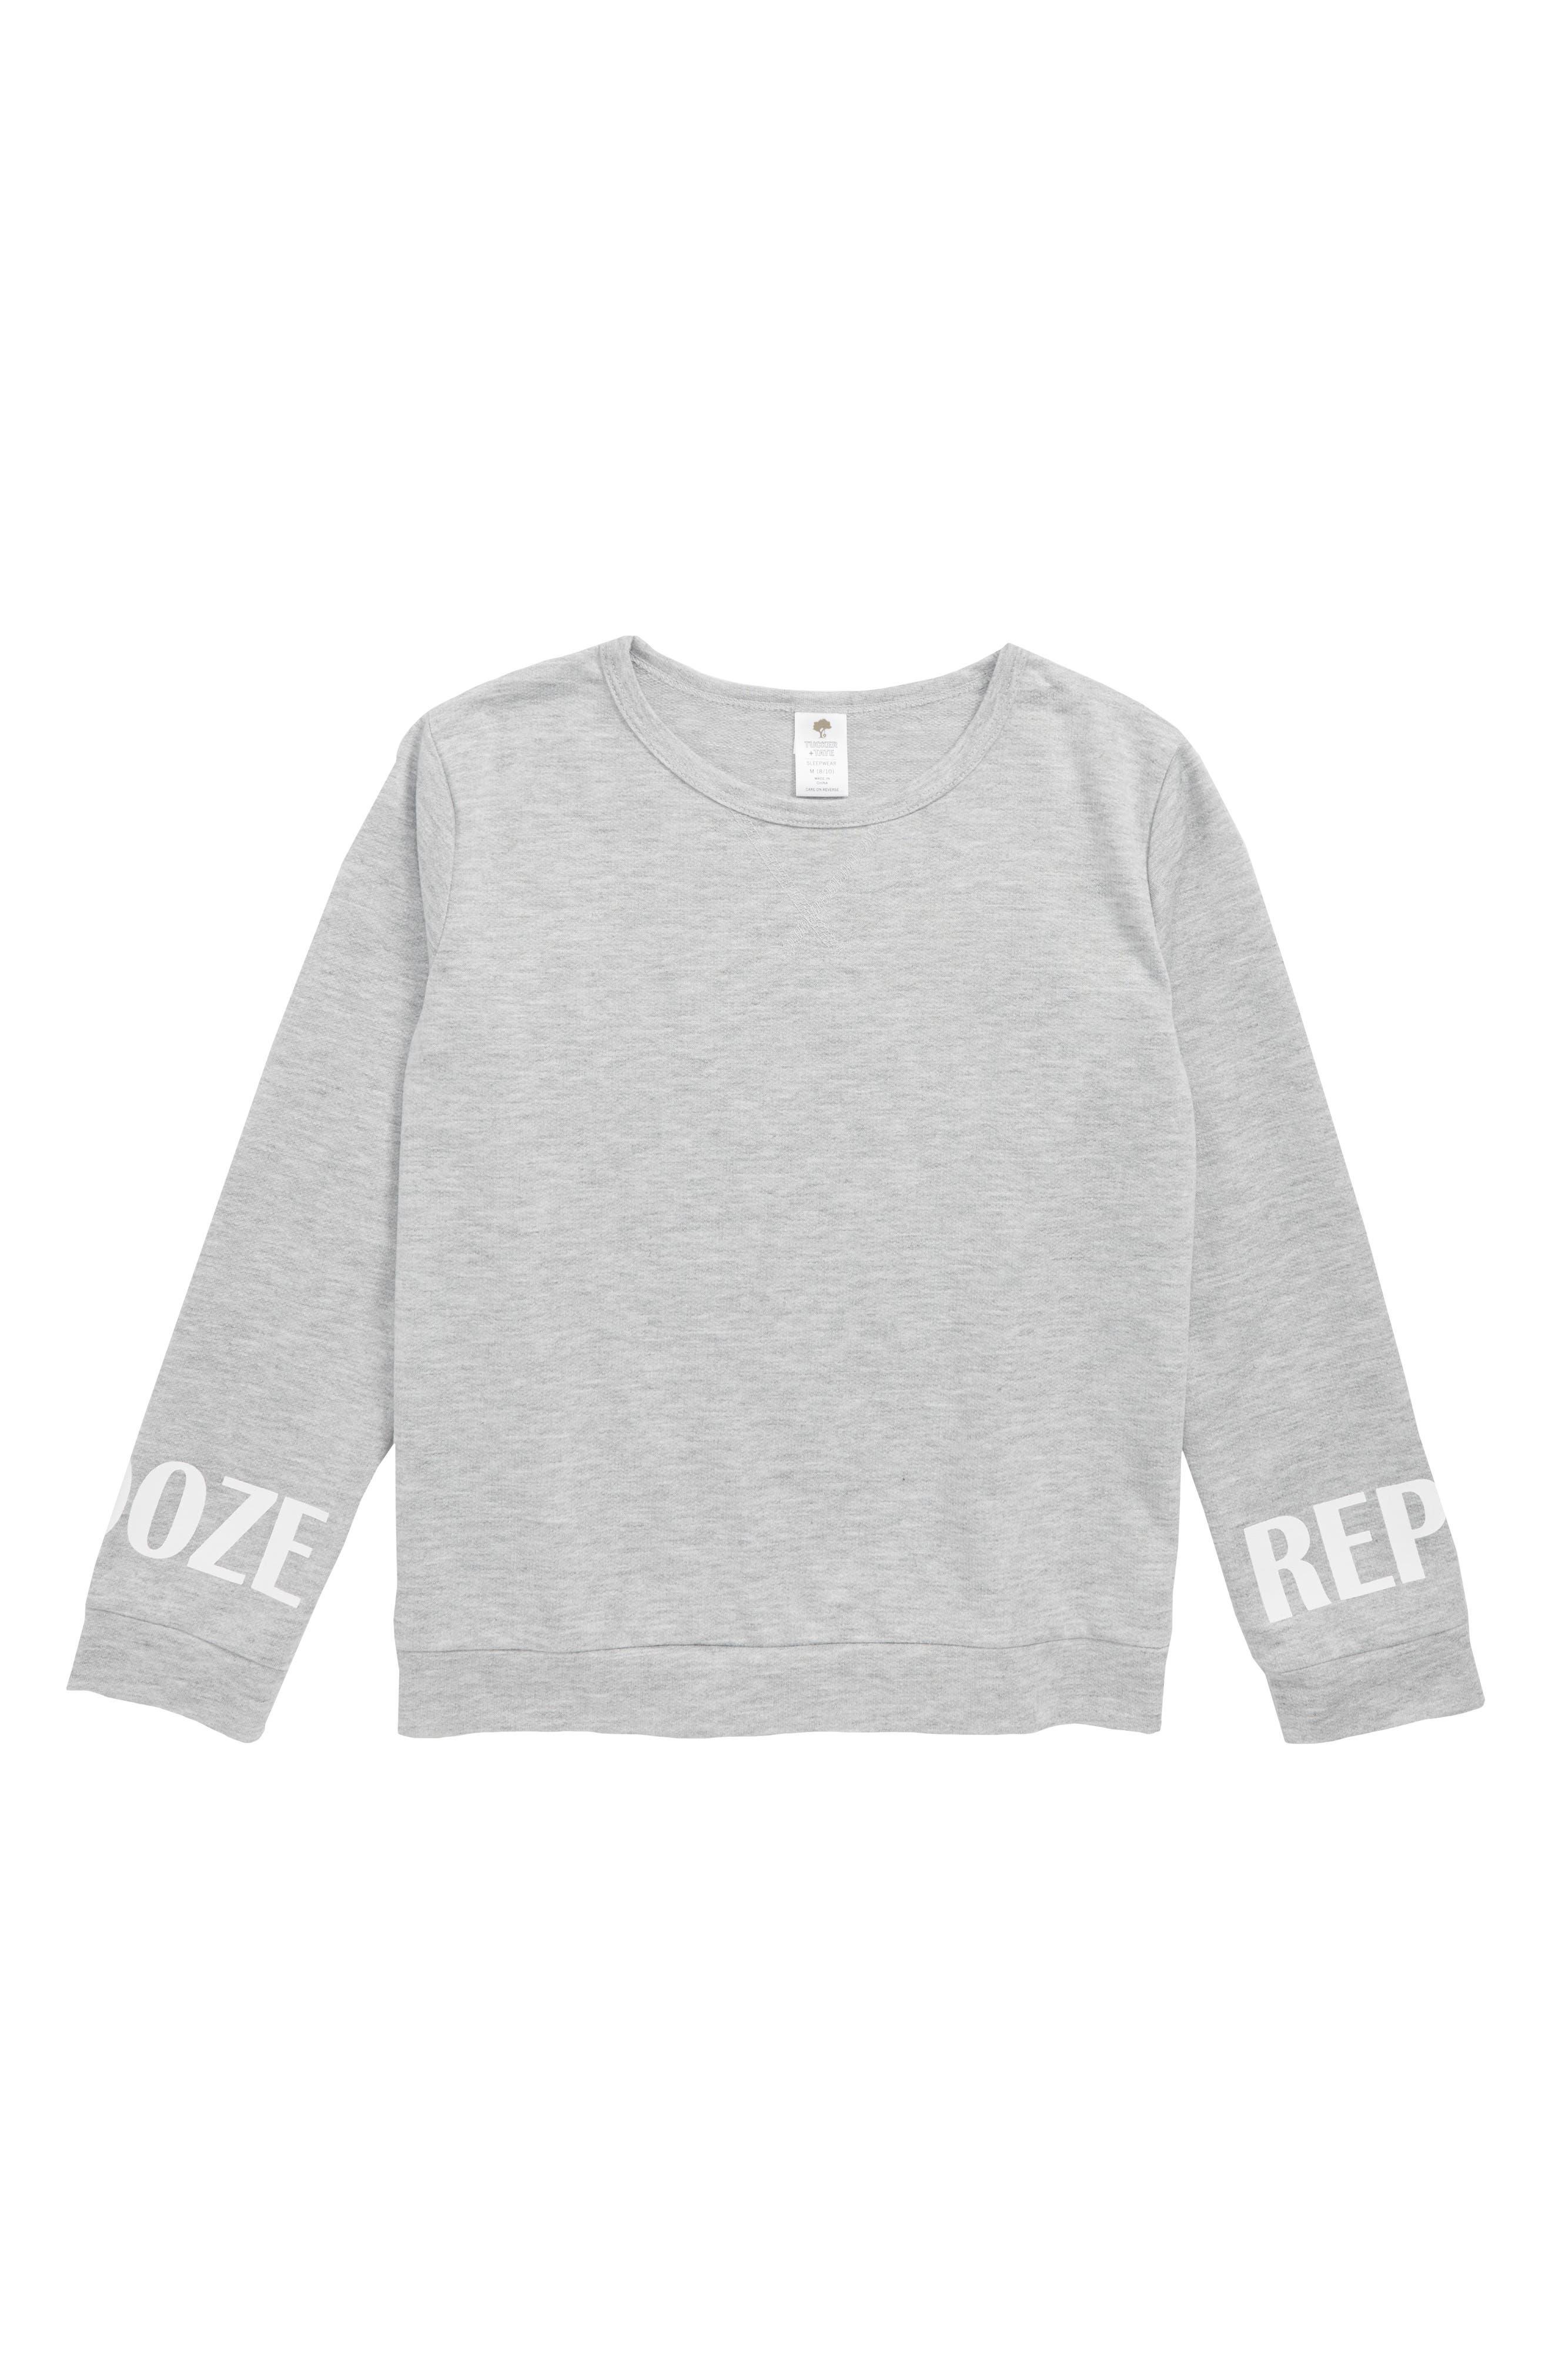 Pajama Sweatshirt,                             Main thumbnail 1, color,                             050